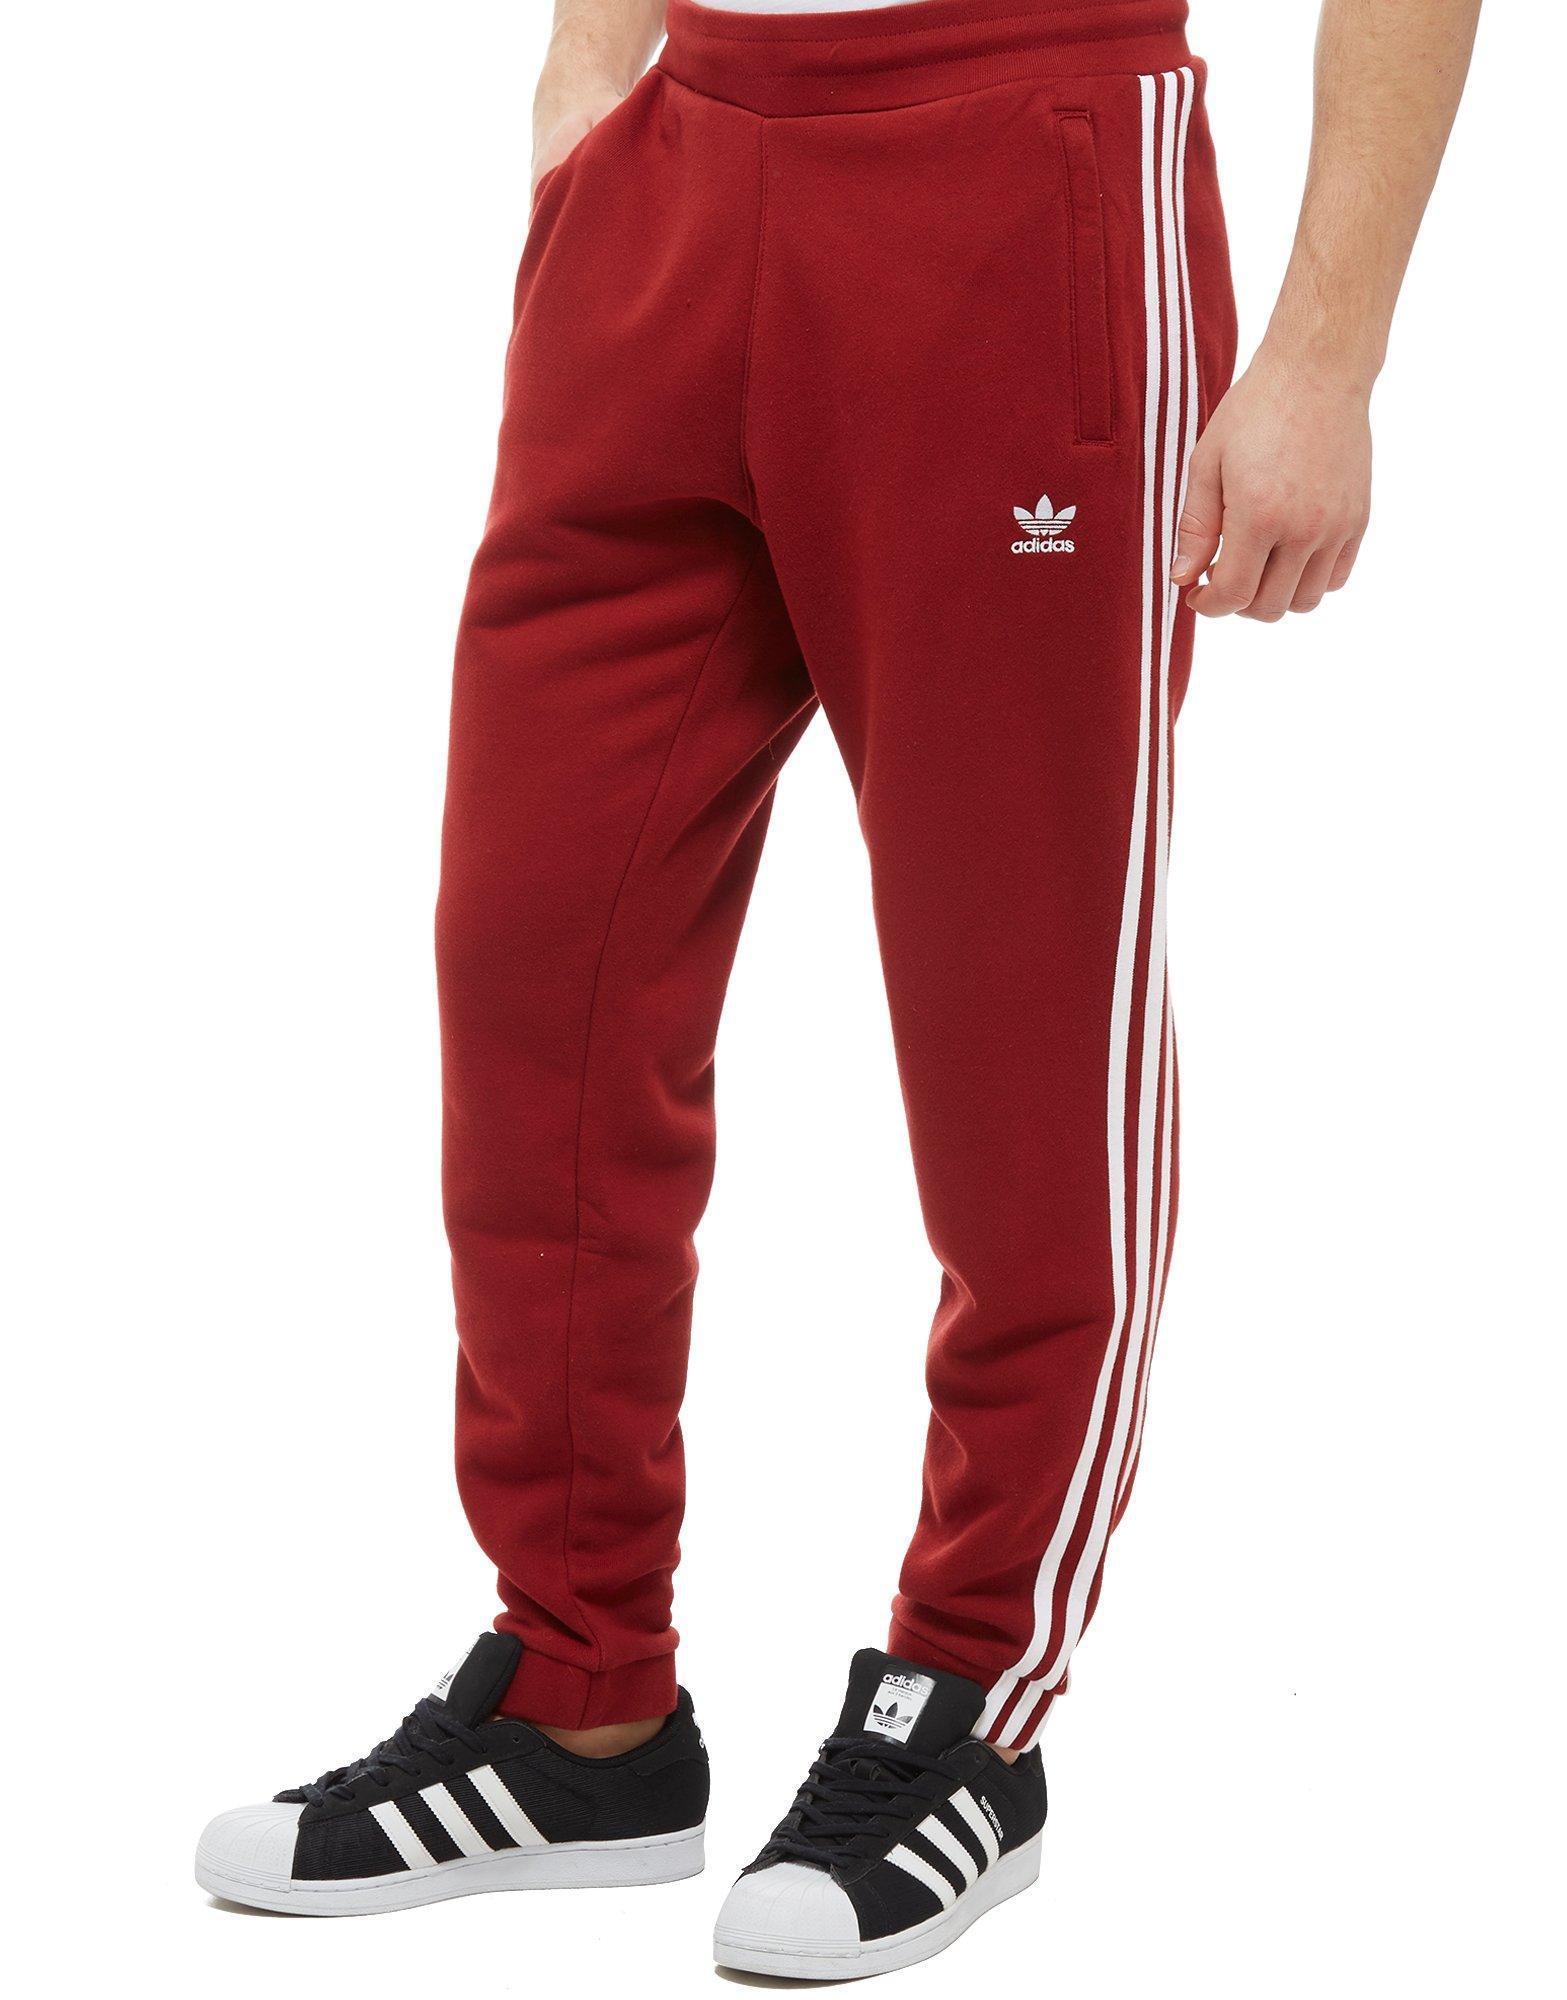 adidas fleece red